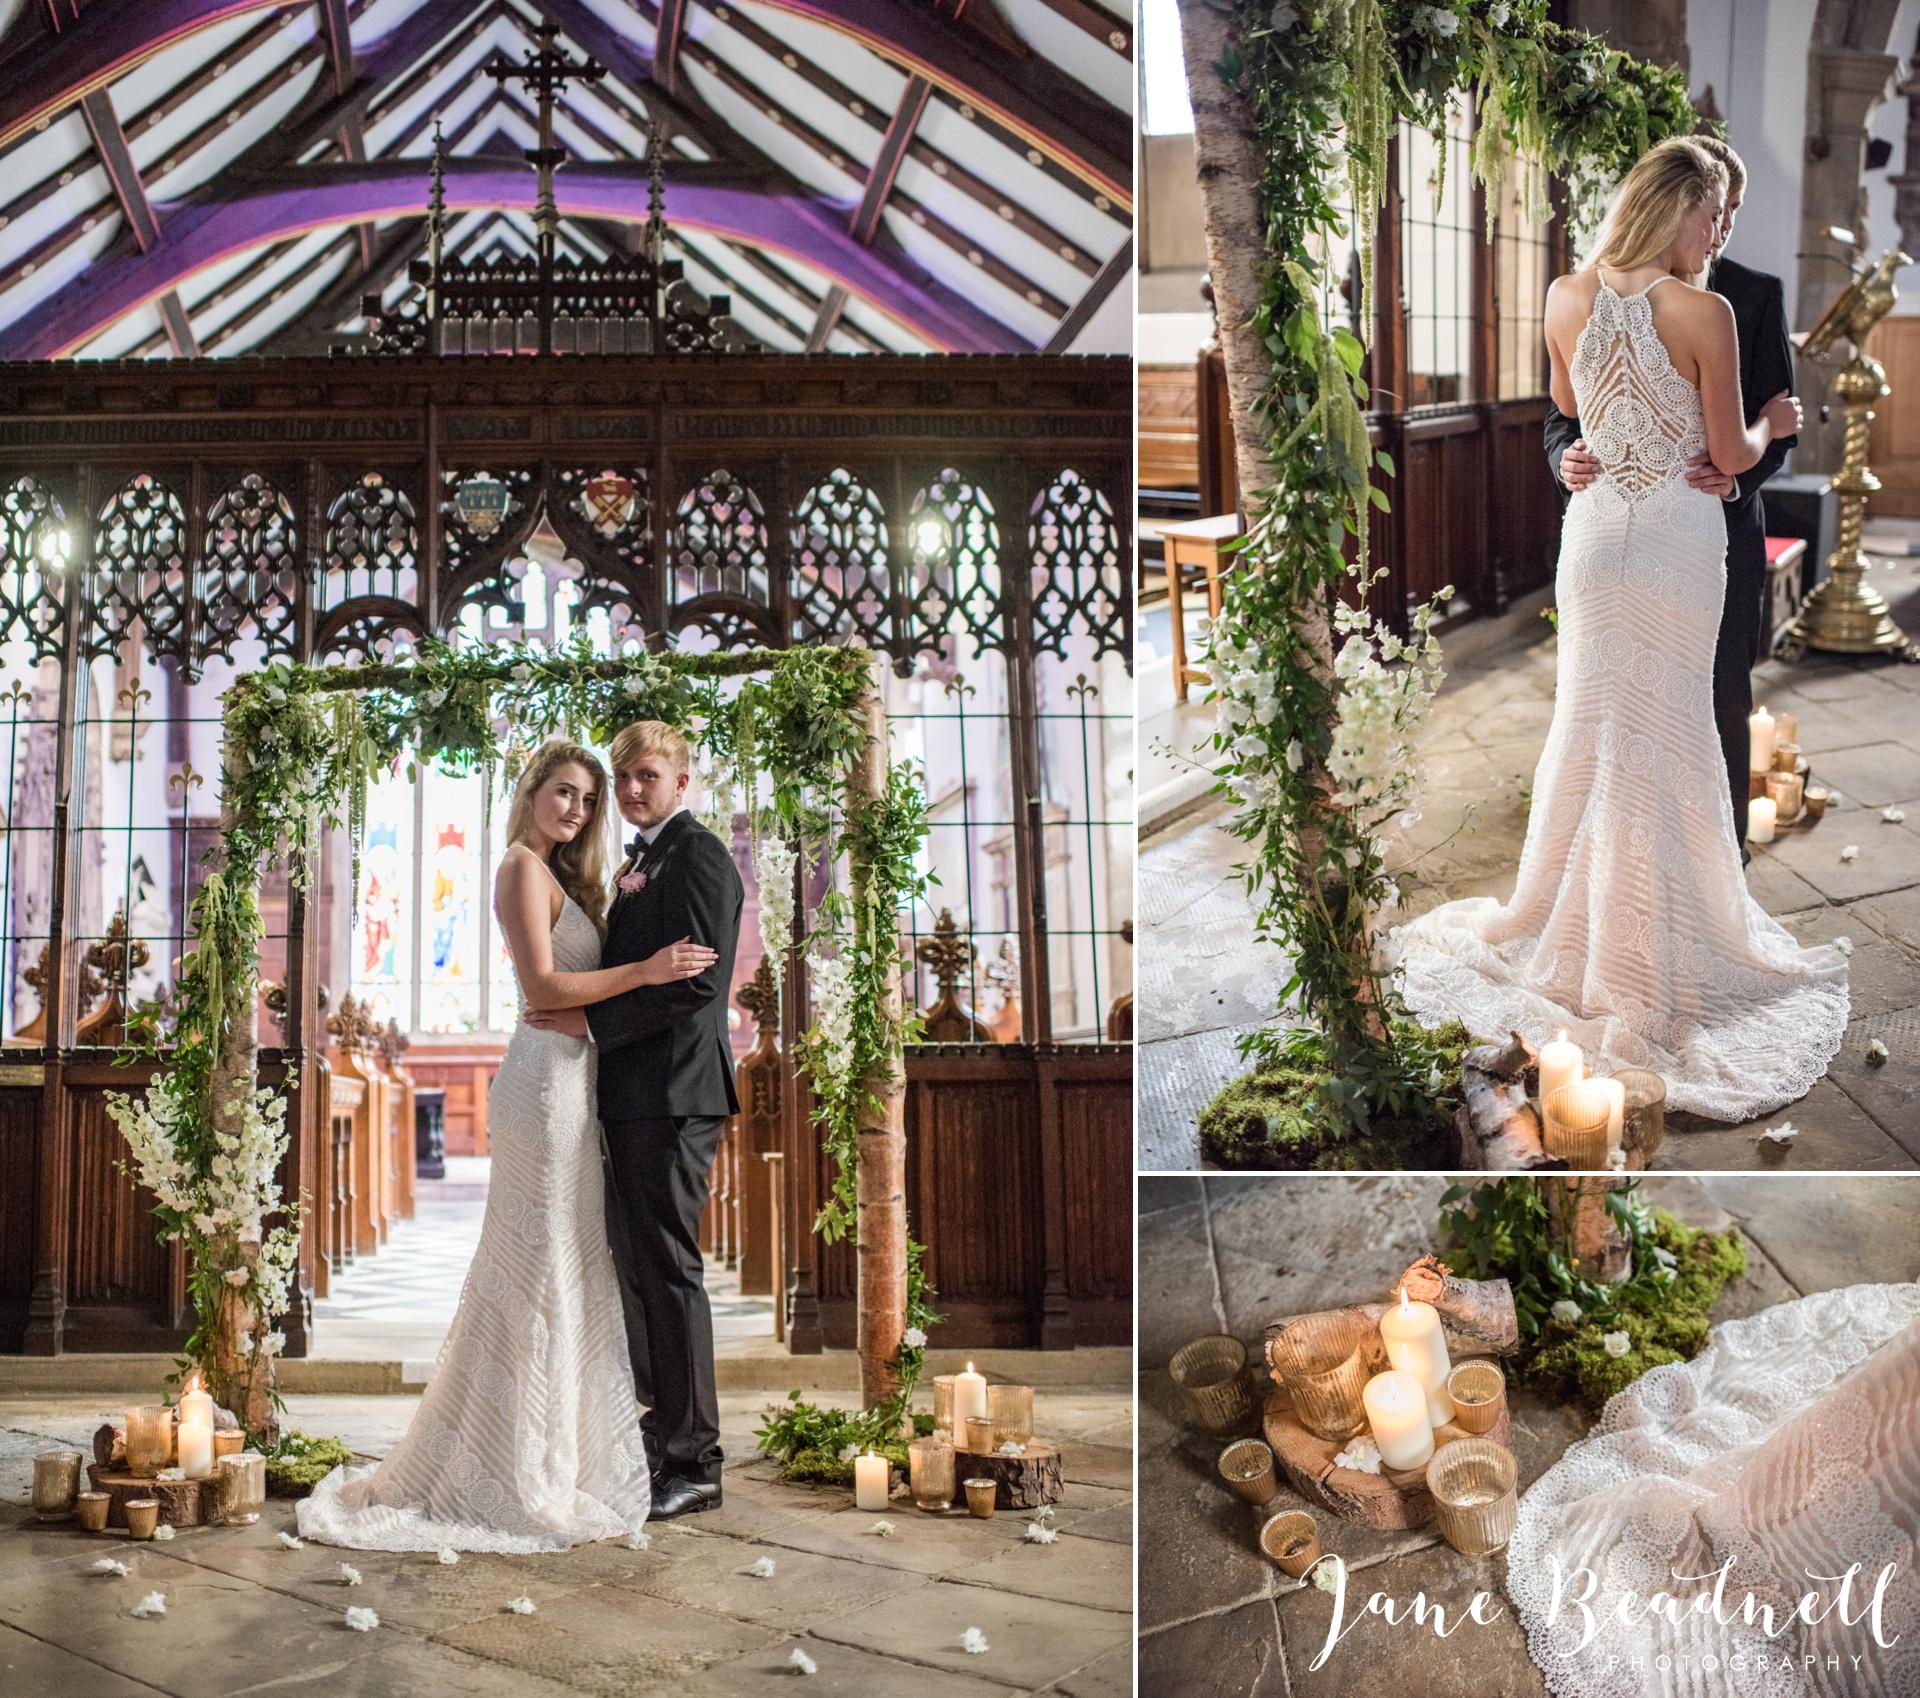 leafy-couture-wedding-flowers-otley-fine-art-wedding-photographer-jane-beadnell-photography_0076